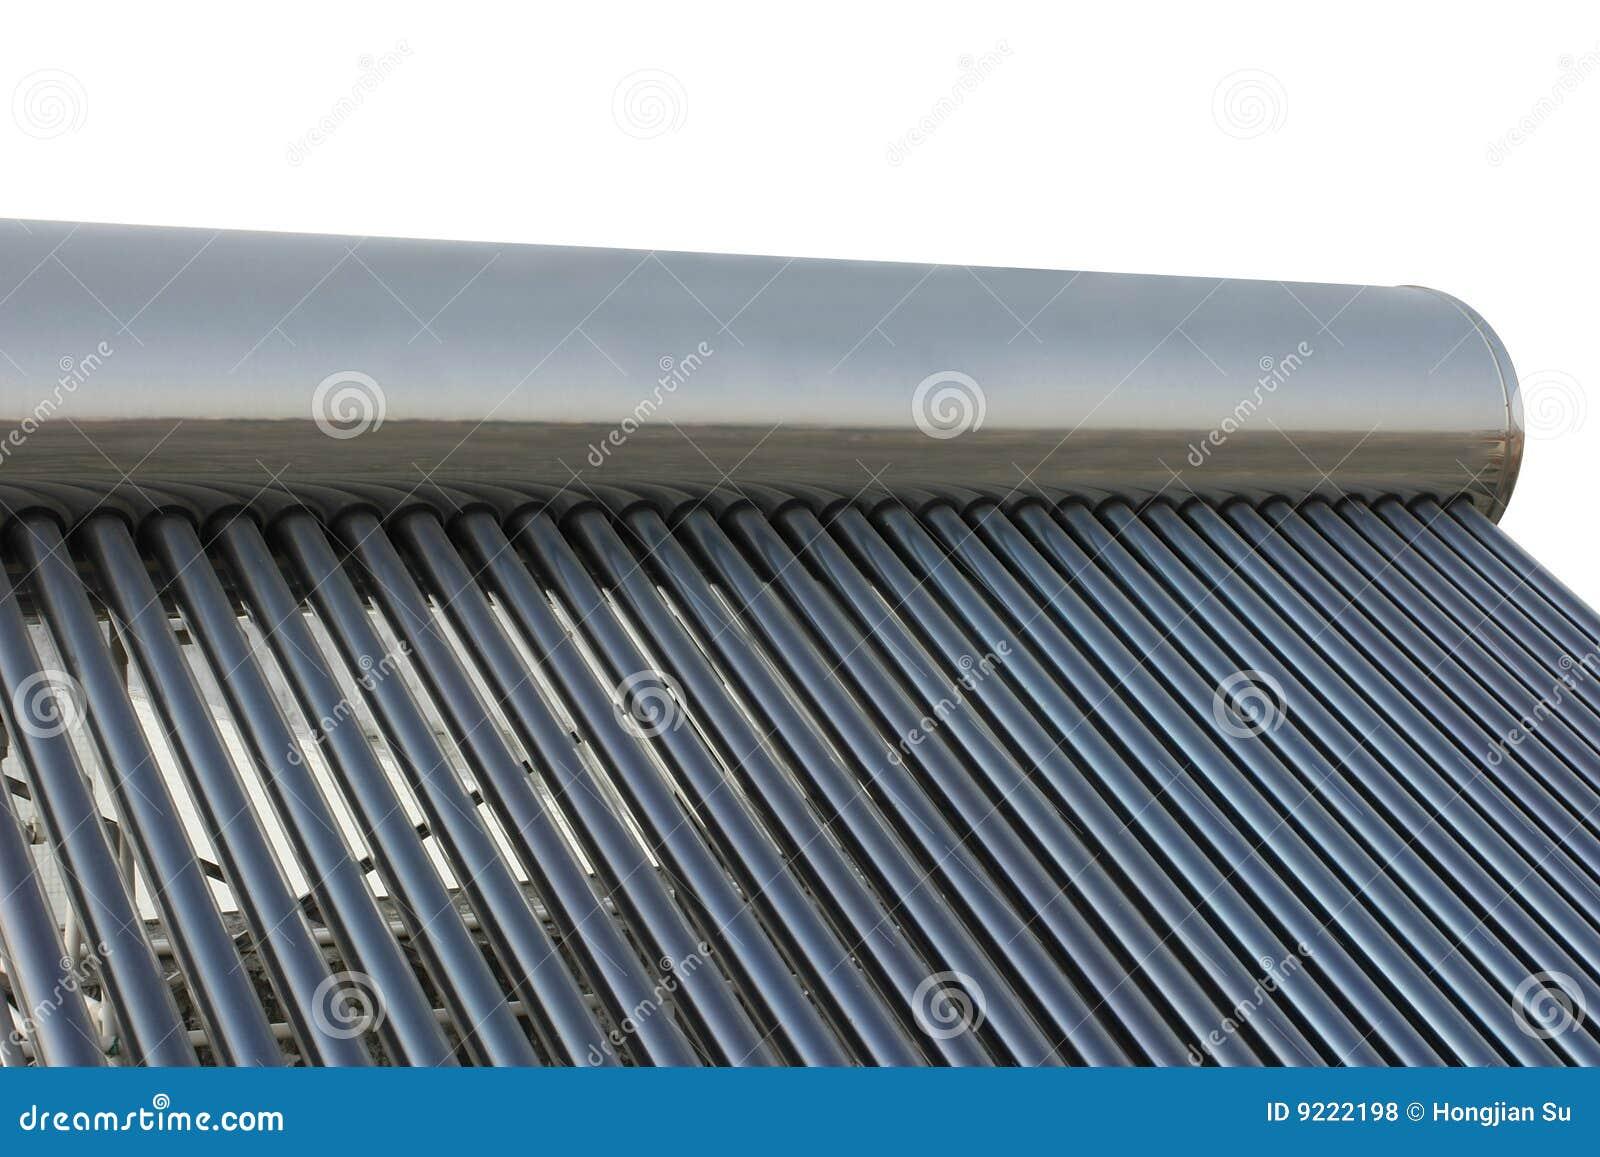 Solar Power Energy Water Heater Stock Photo Image Of